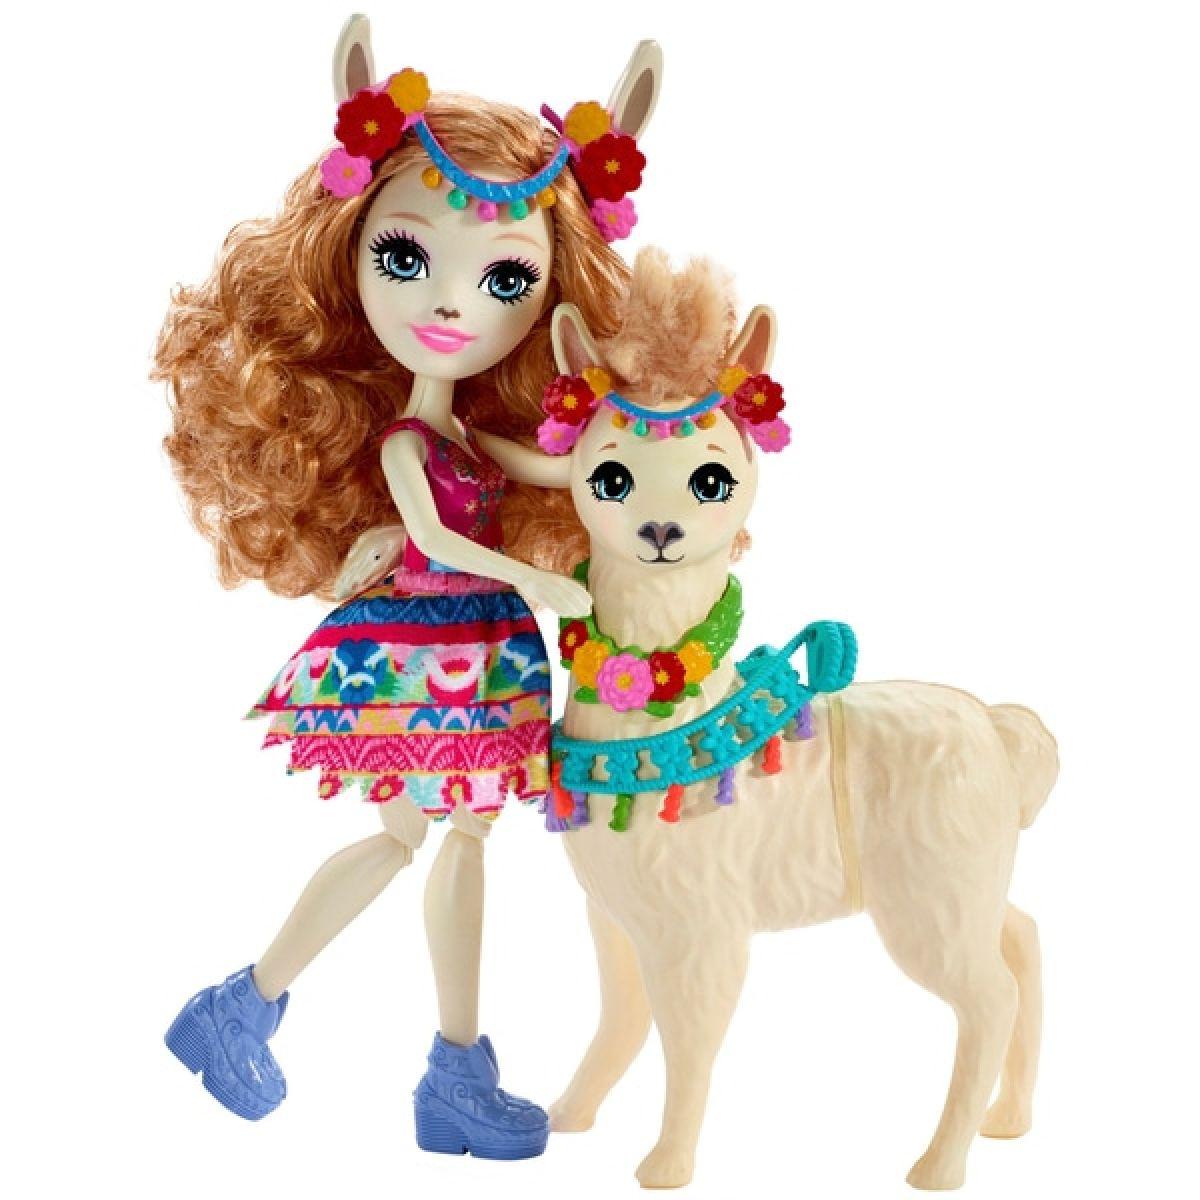 Enchantimals panenka s velkým zvířátkem Lama